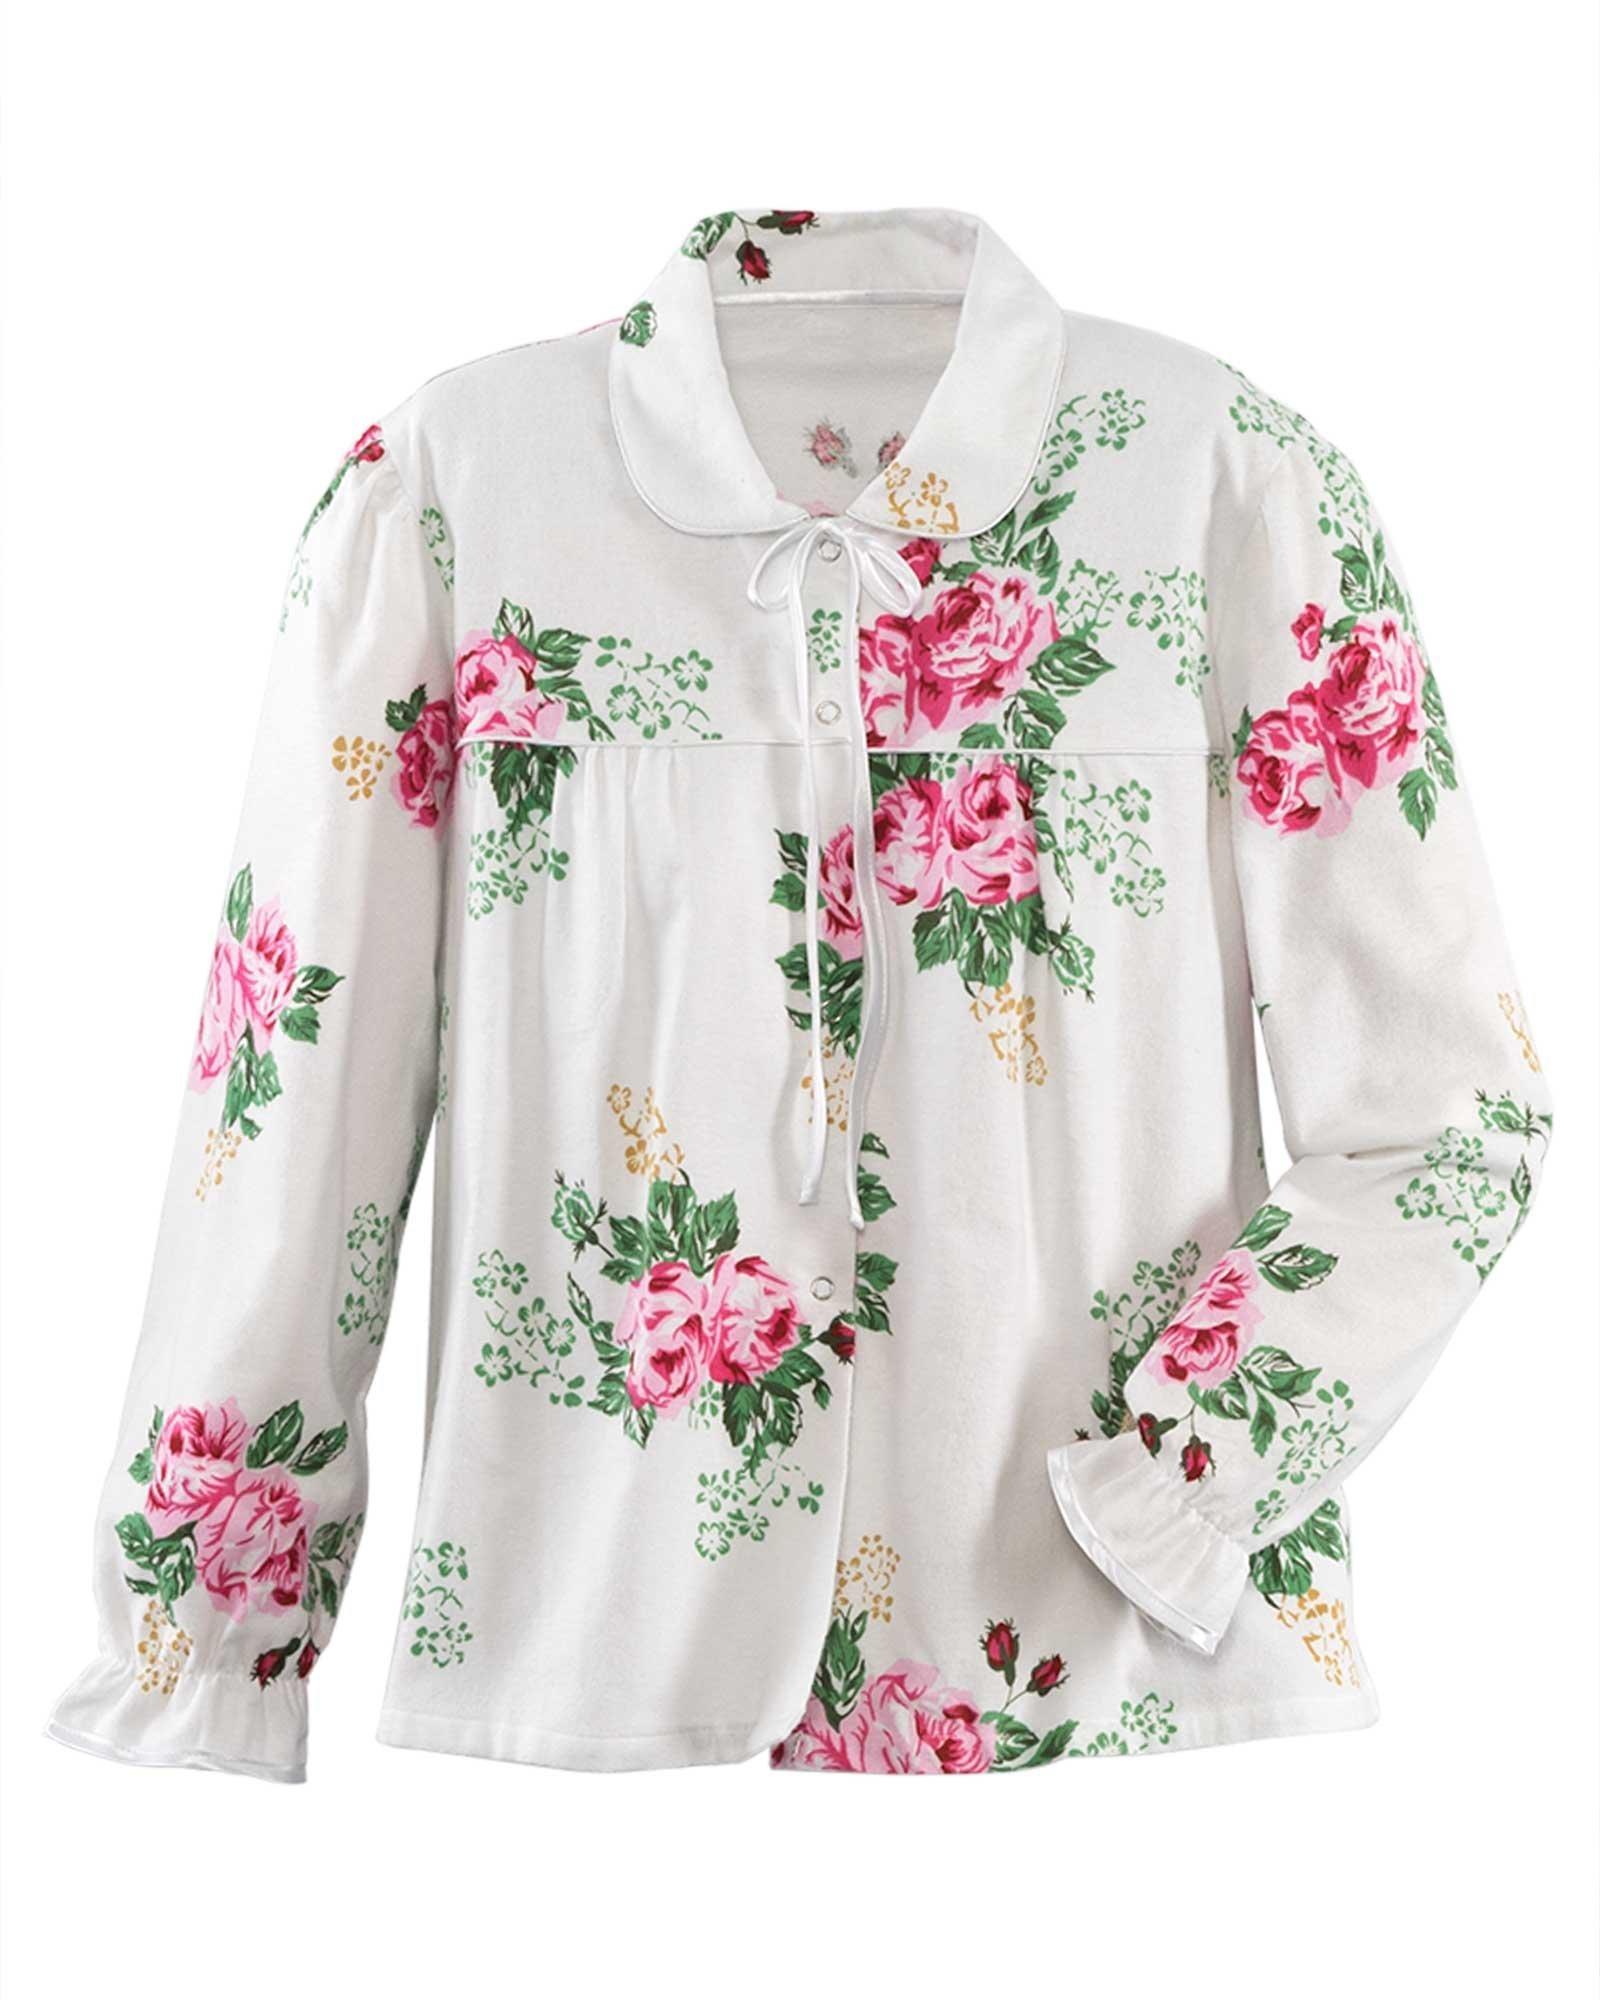 La Cera Flannel Bed Jacket, Rose Print, 2X by La Cera